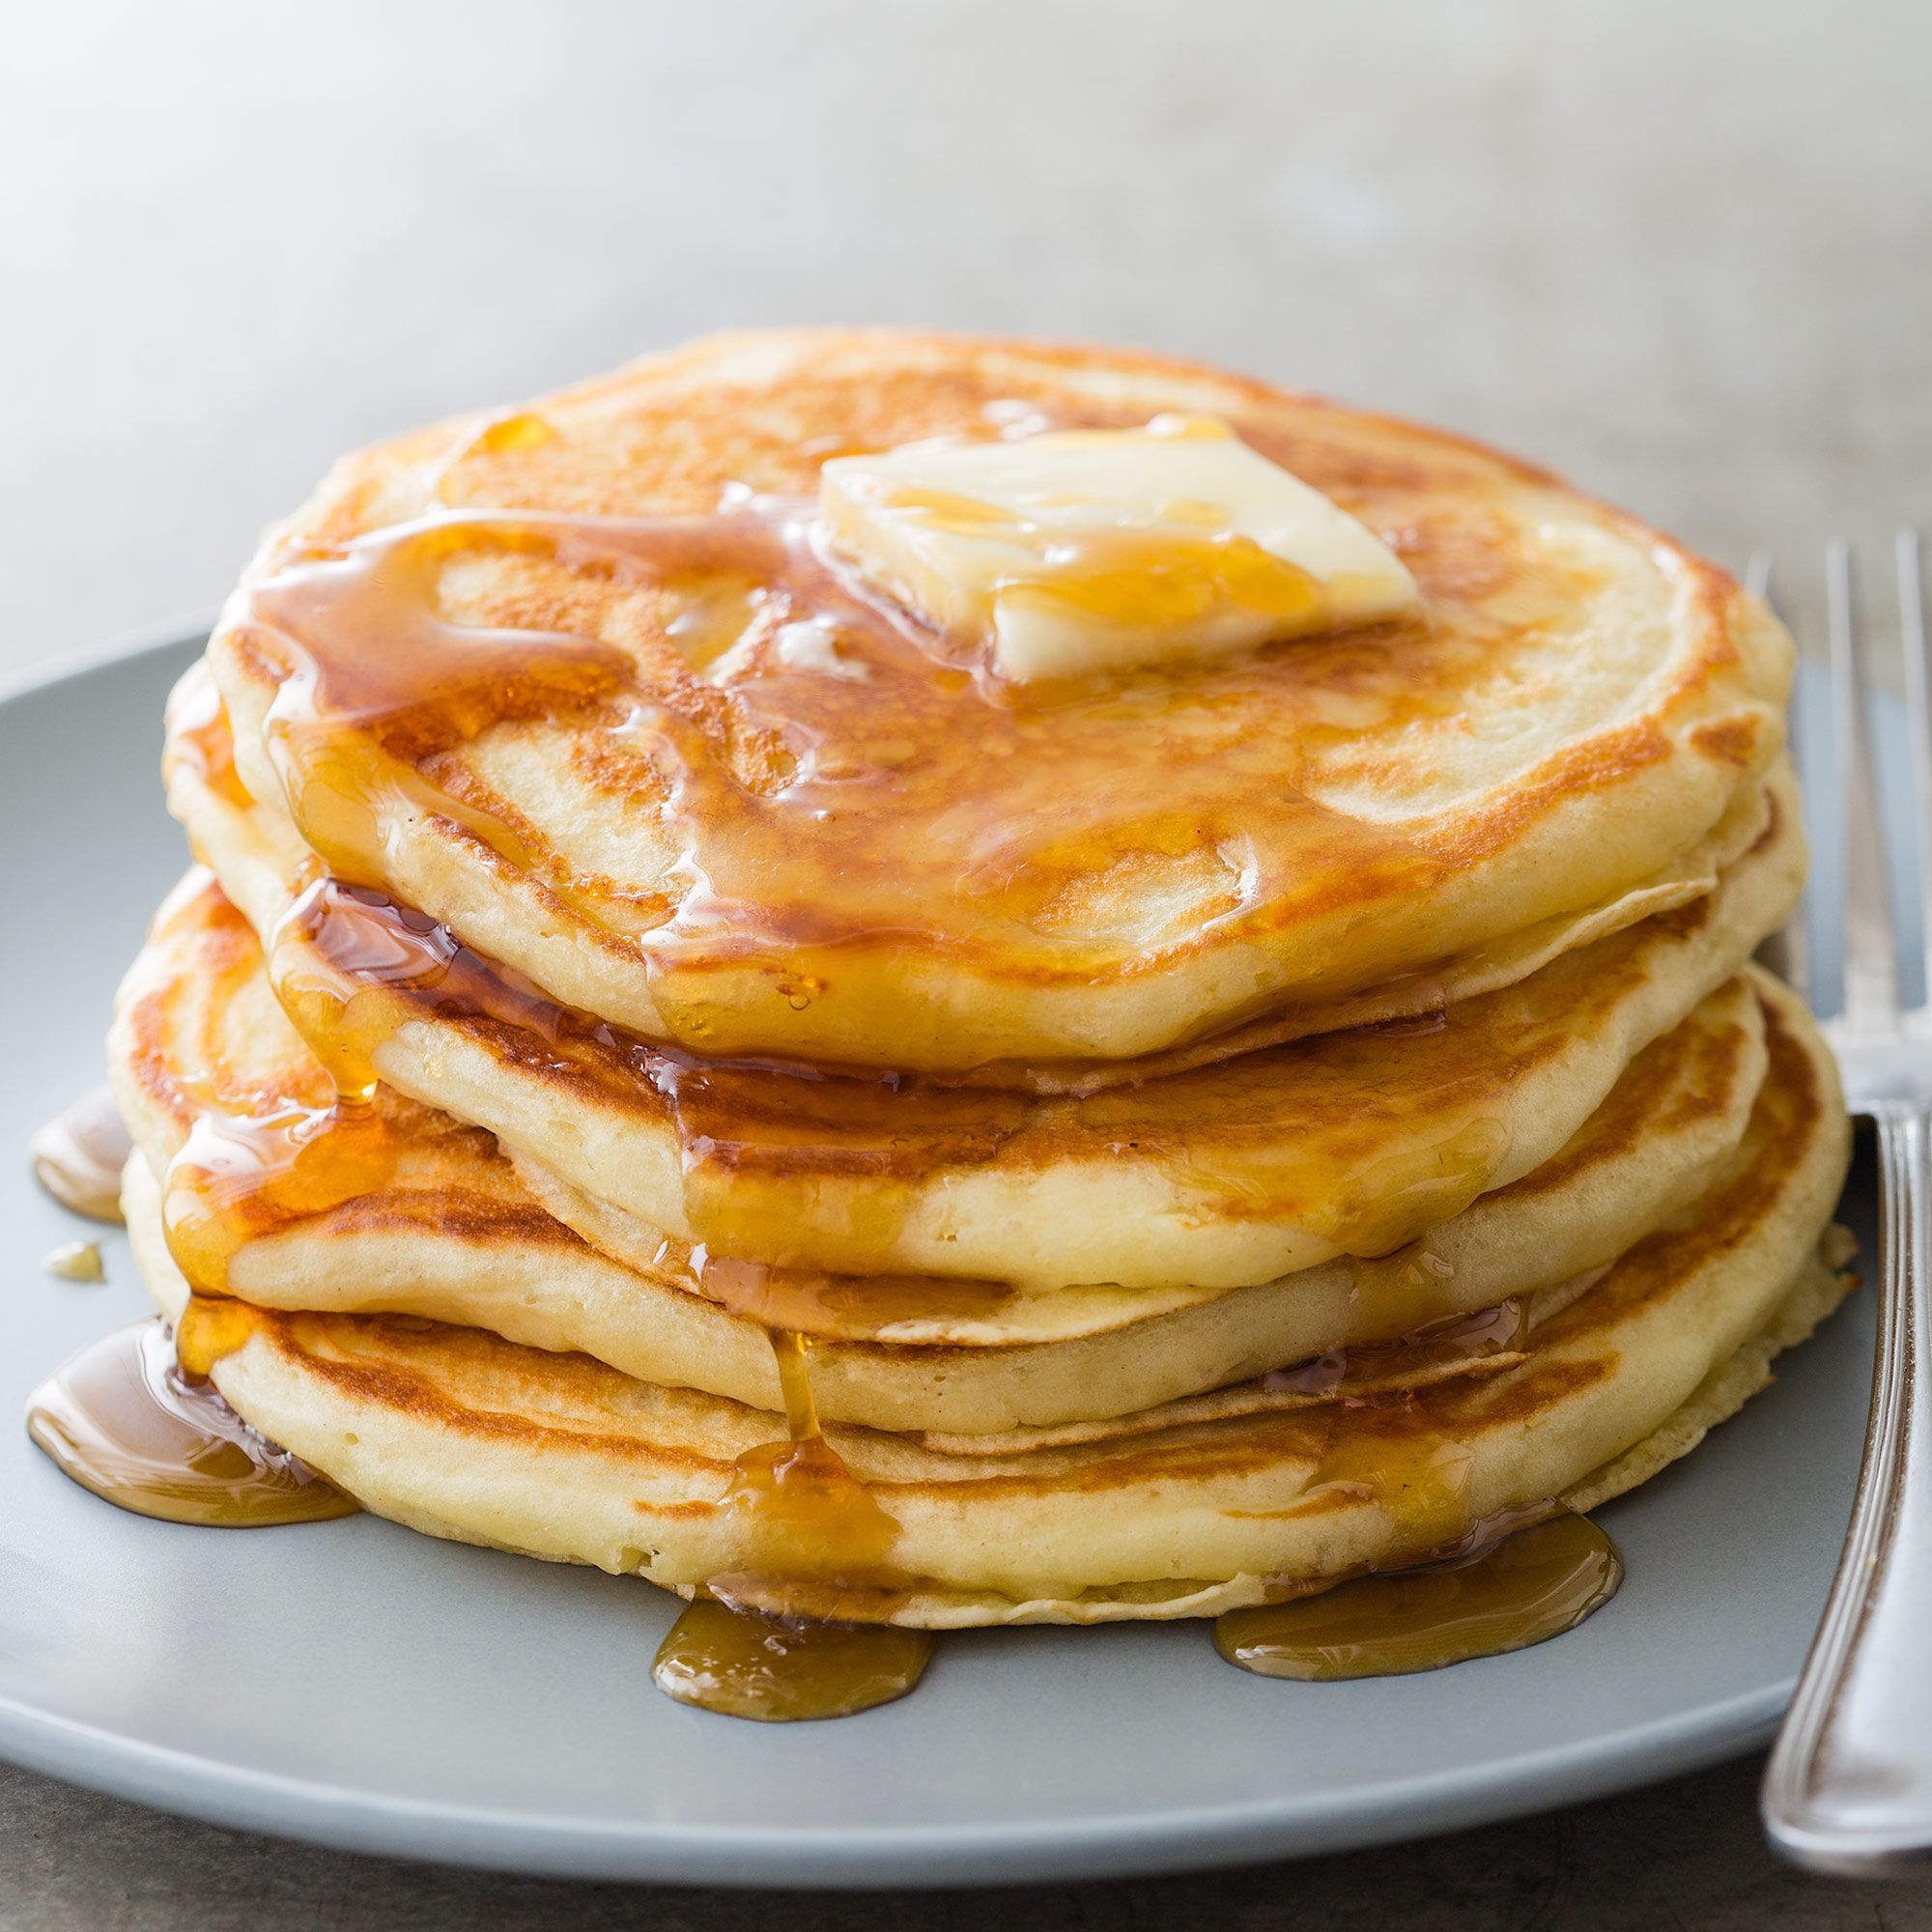 Best Sour Cream Buttermilk Pancakes In 2020 Pancake Recipe Buttermilk Cooks Illustrated Recipes Buttermilk Pancakes